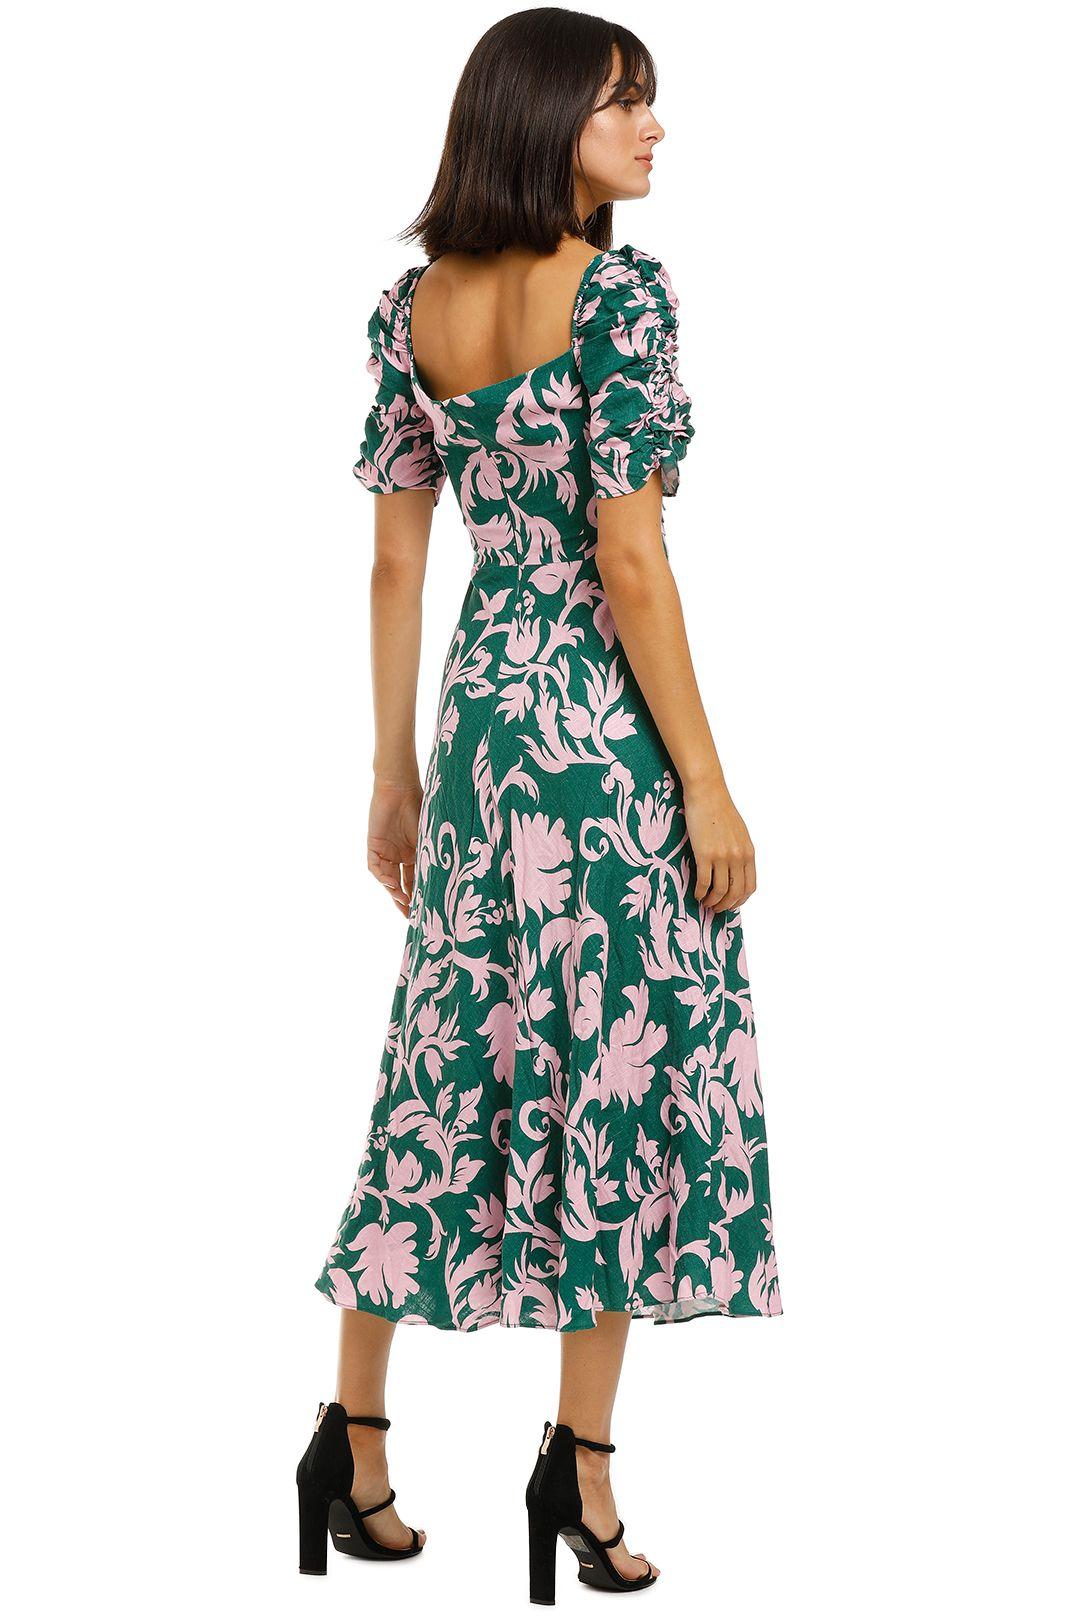 Keepsake-the-Label-Wistful-Midi-Dress-Jade-Baroque-Back